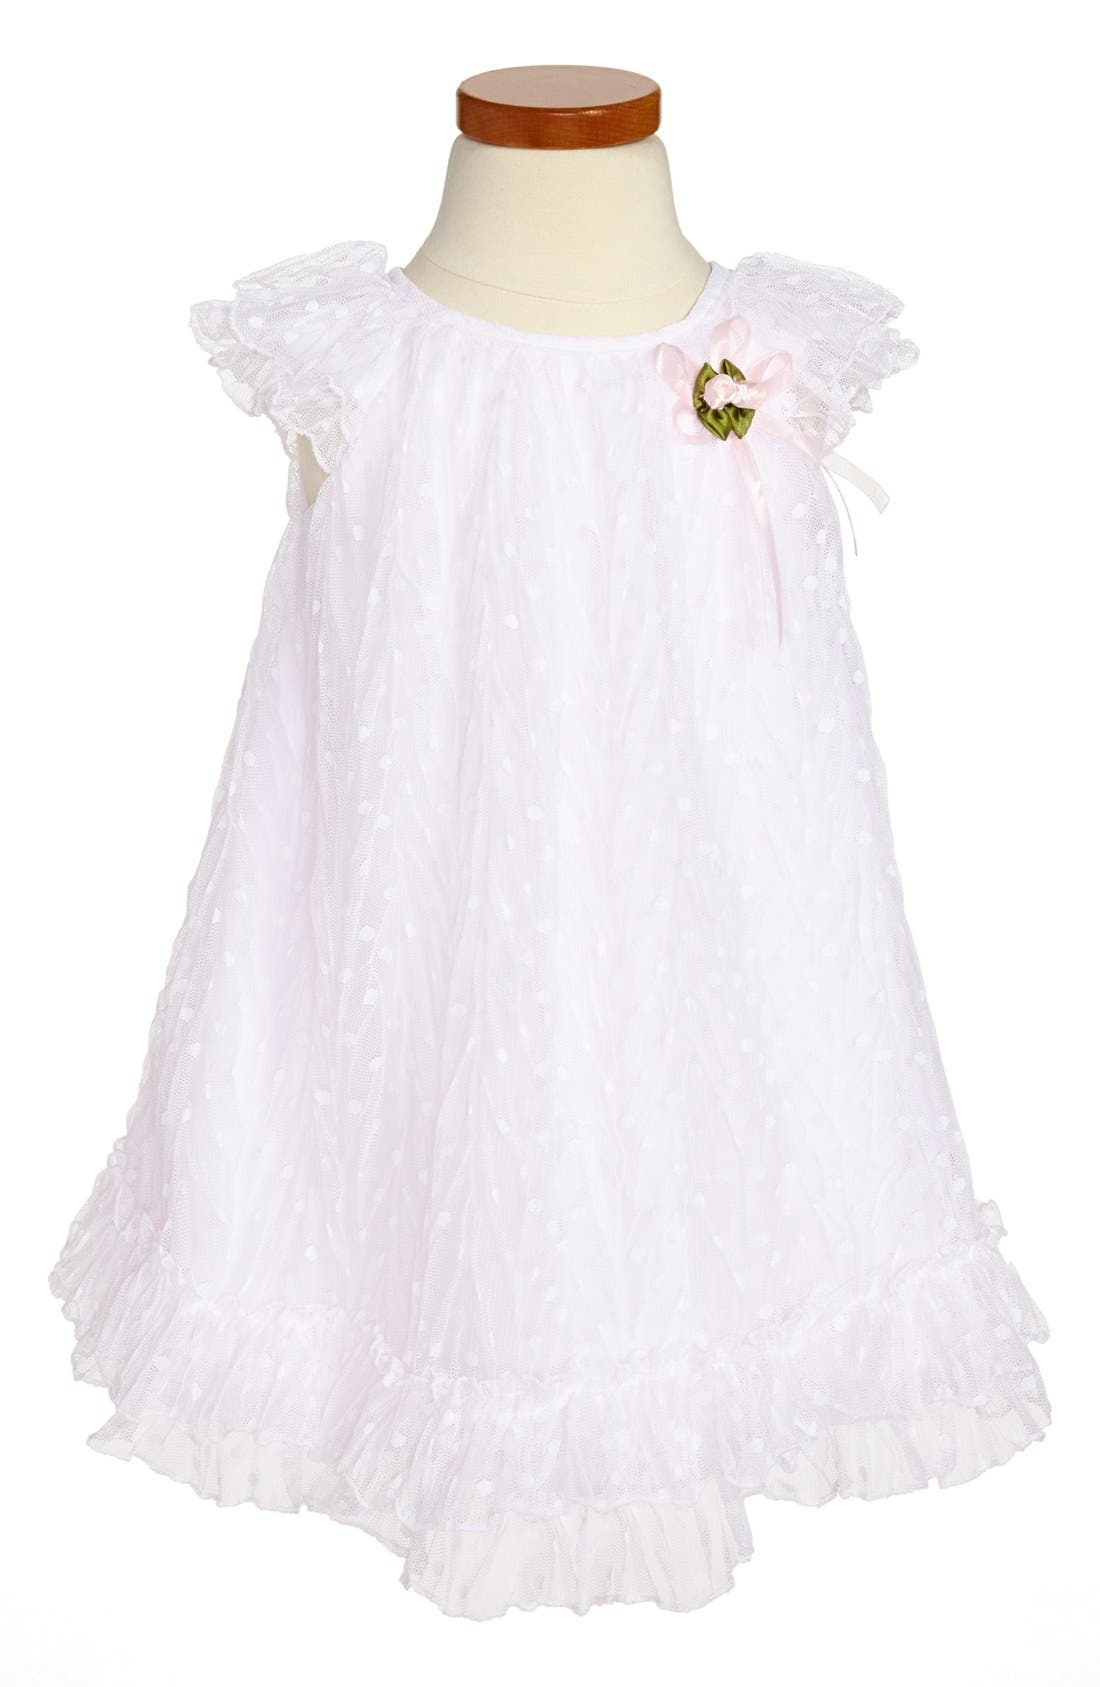 Main Image - Pippa & Julie Point d'Esprit Dress (Toddler Girls)